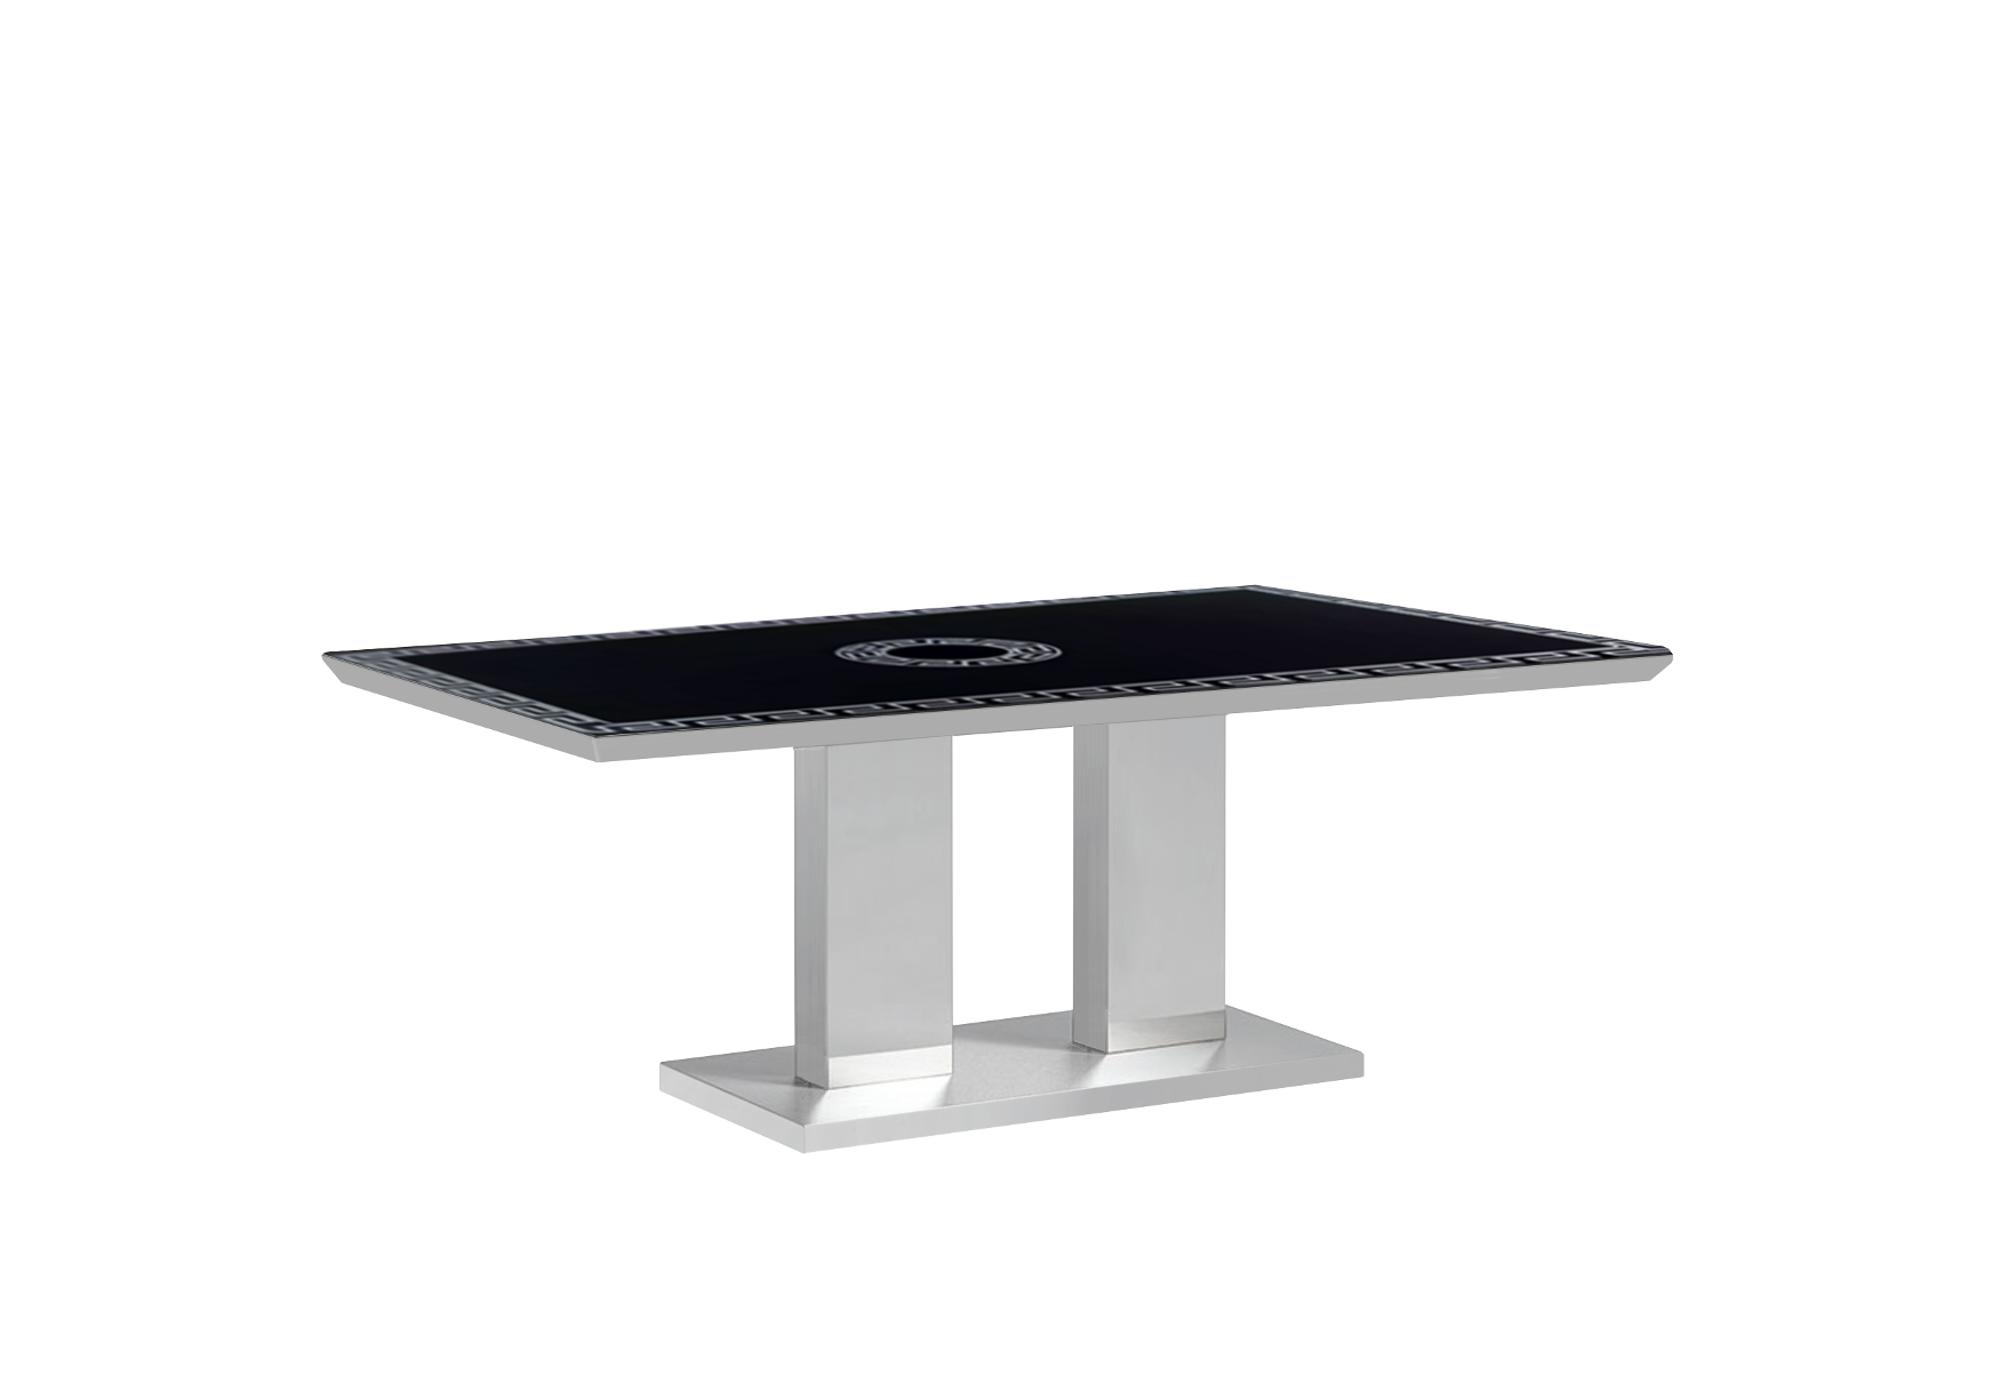 Table basse chromé versace IZA